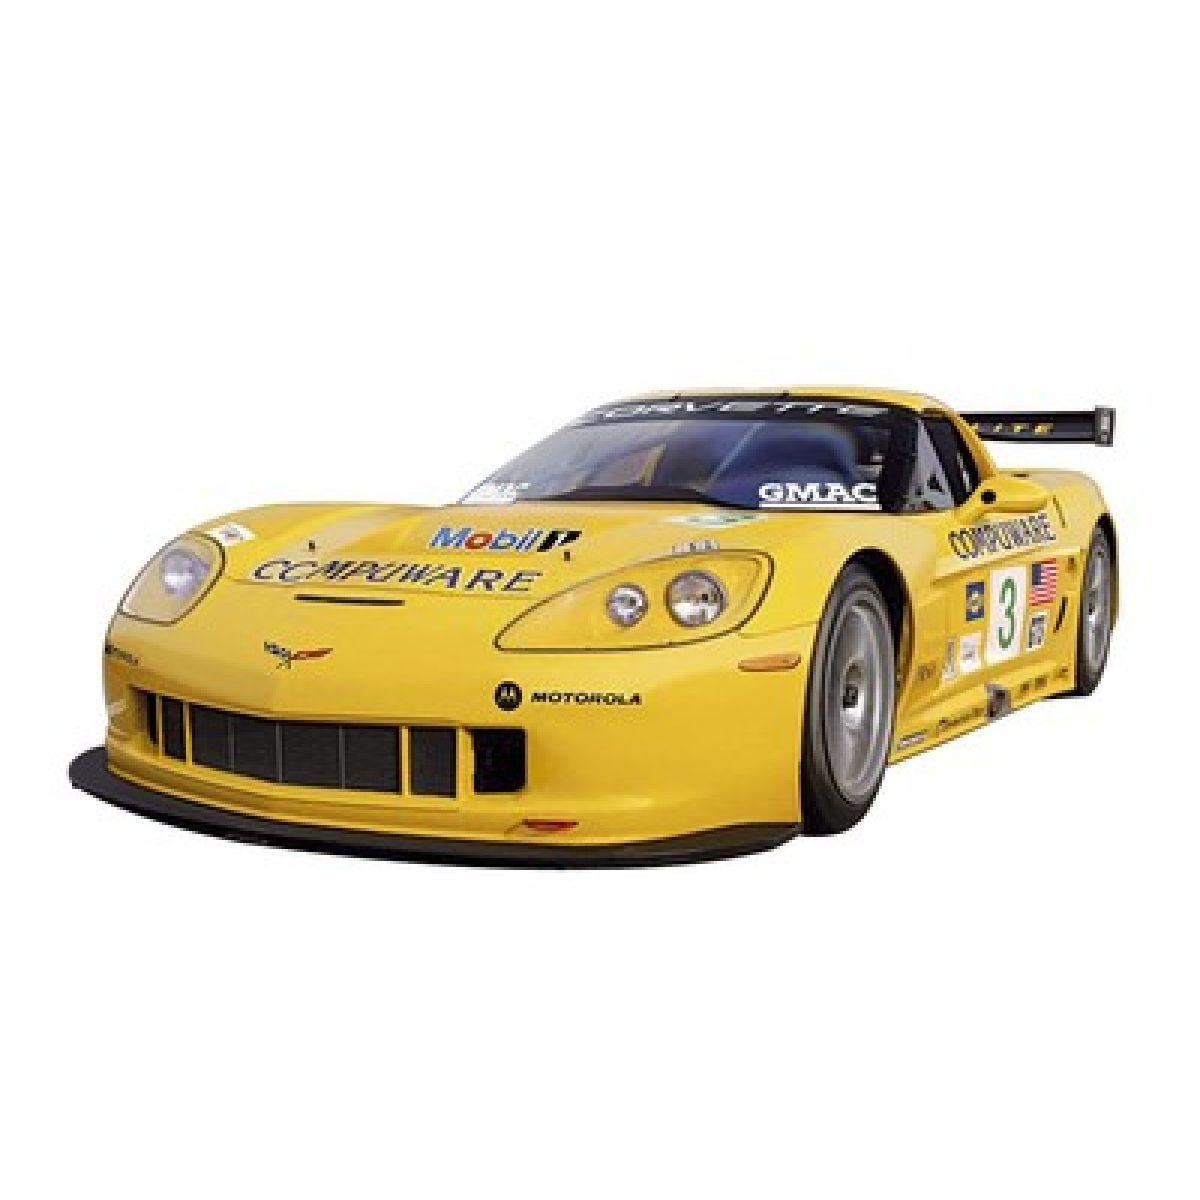 Carrera Chevrolet Corvette C6R yellow